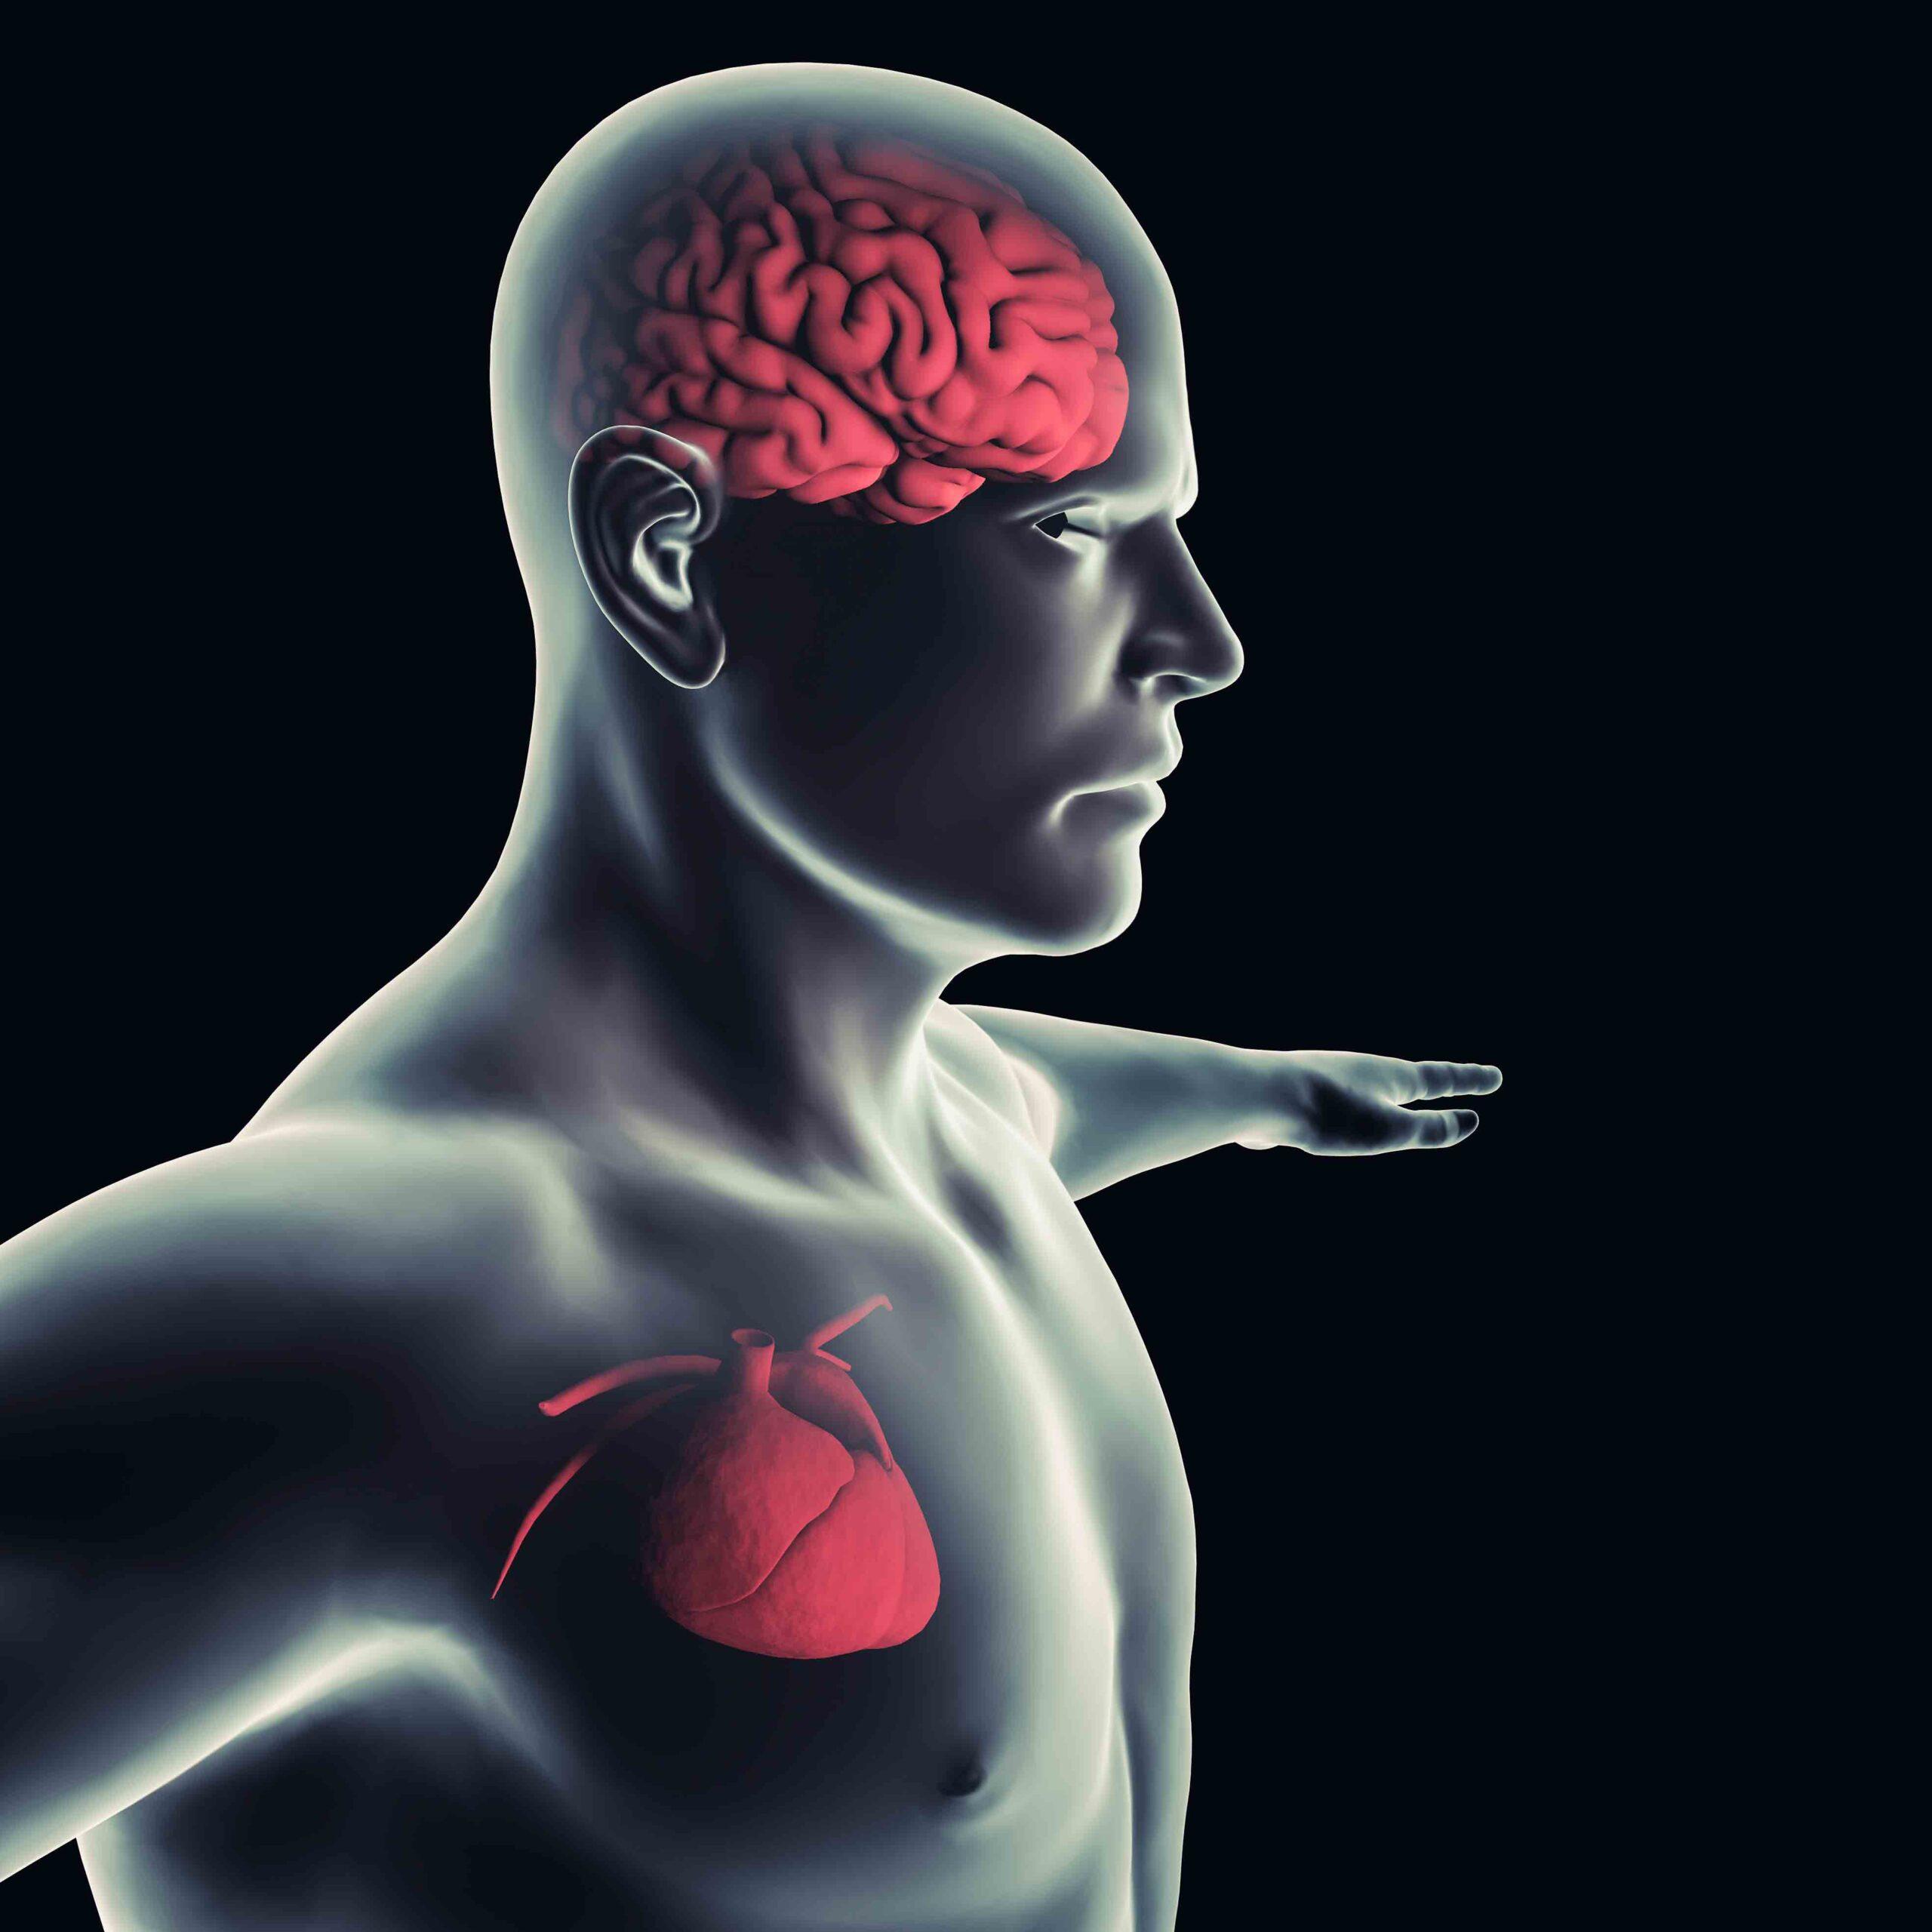 Kopf-Herz-Verbindung